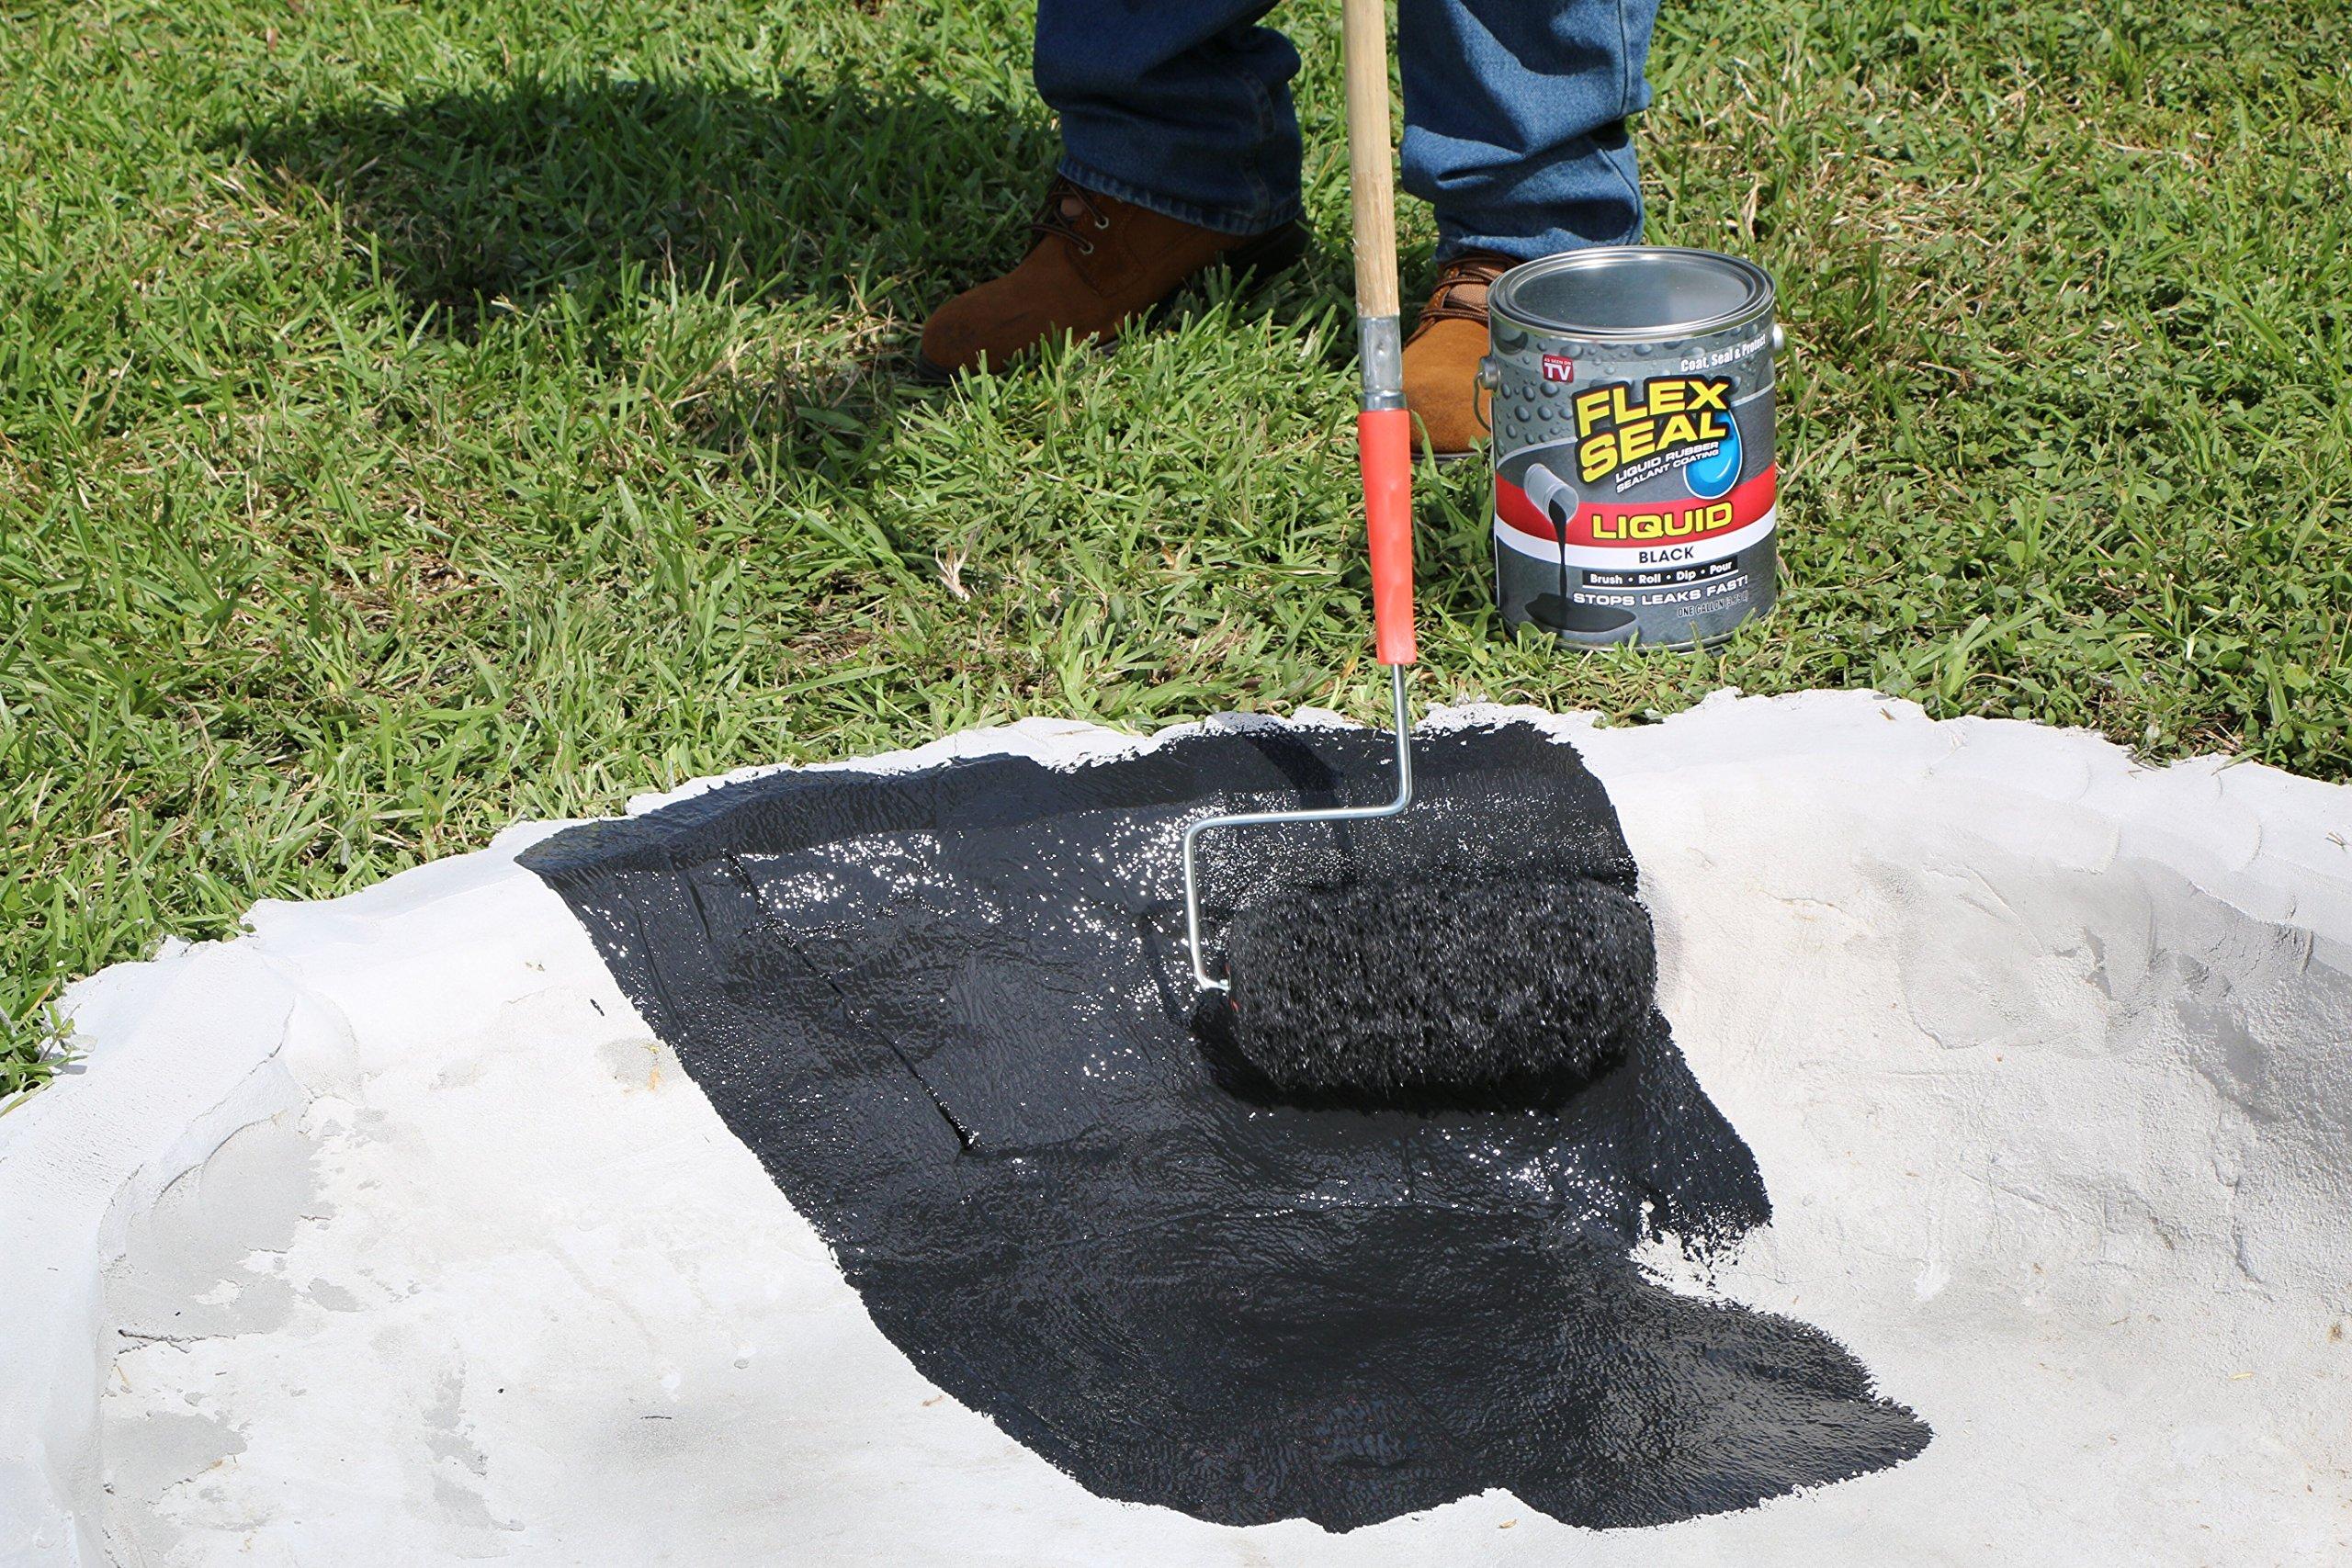 Flex Seal Liquid Rubber in a Can, 32-oz, Black by Flex Seal Liquid (Image #7)